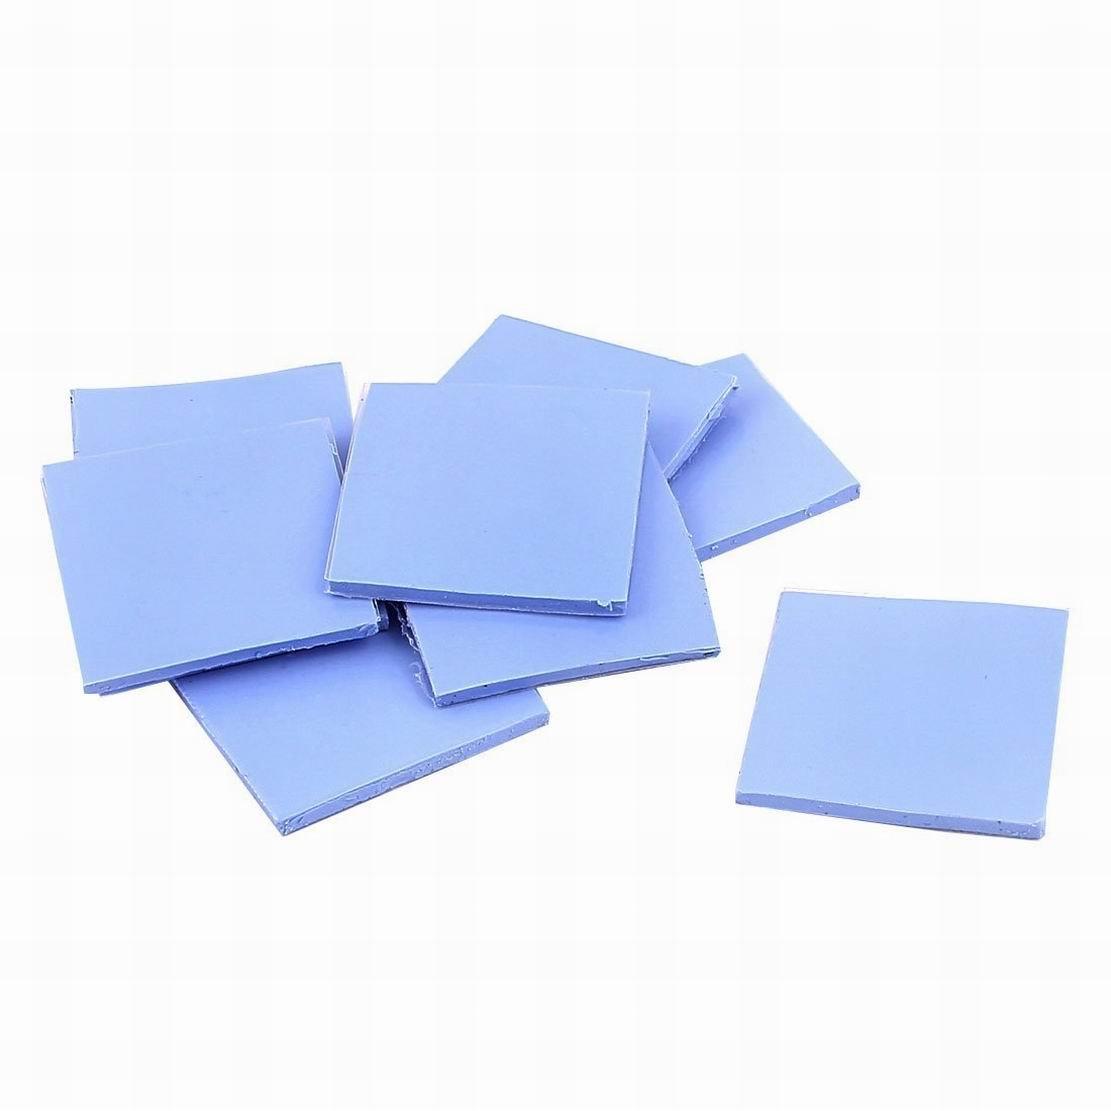 MariaP 10 Pcs Blue Thermal Pad CPU Heatsink Conductive Silicone 30mmx30mmx2mm